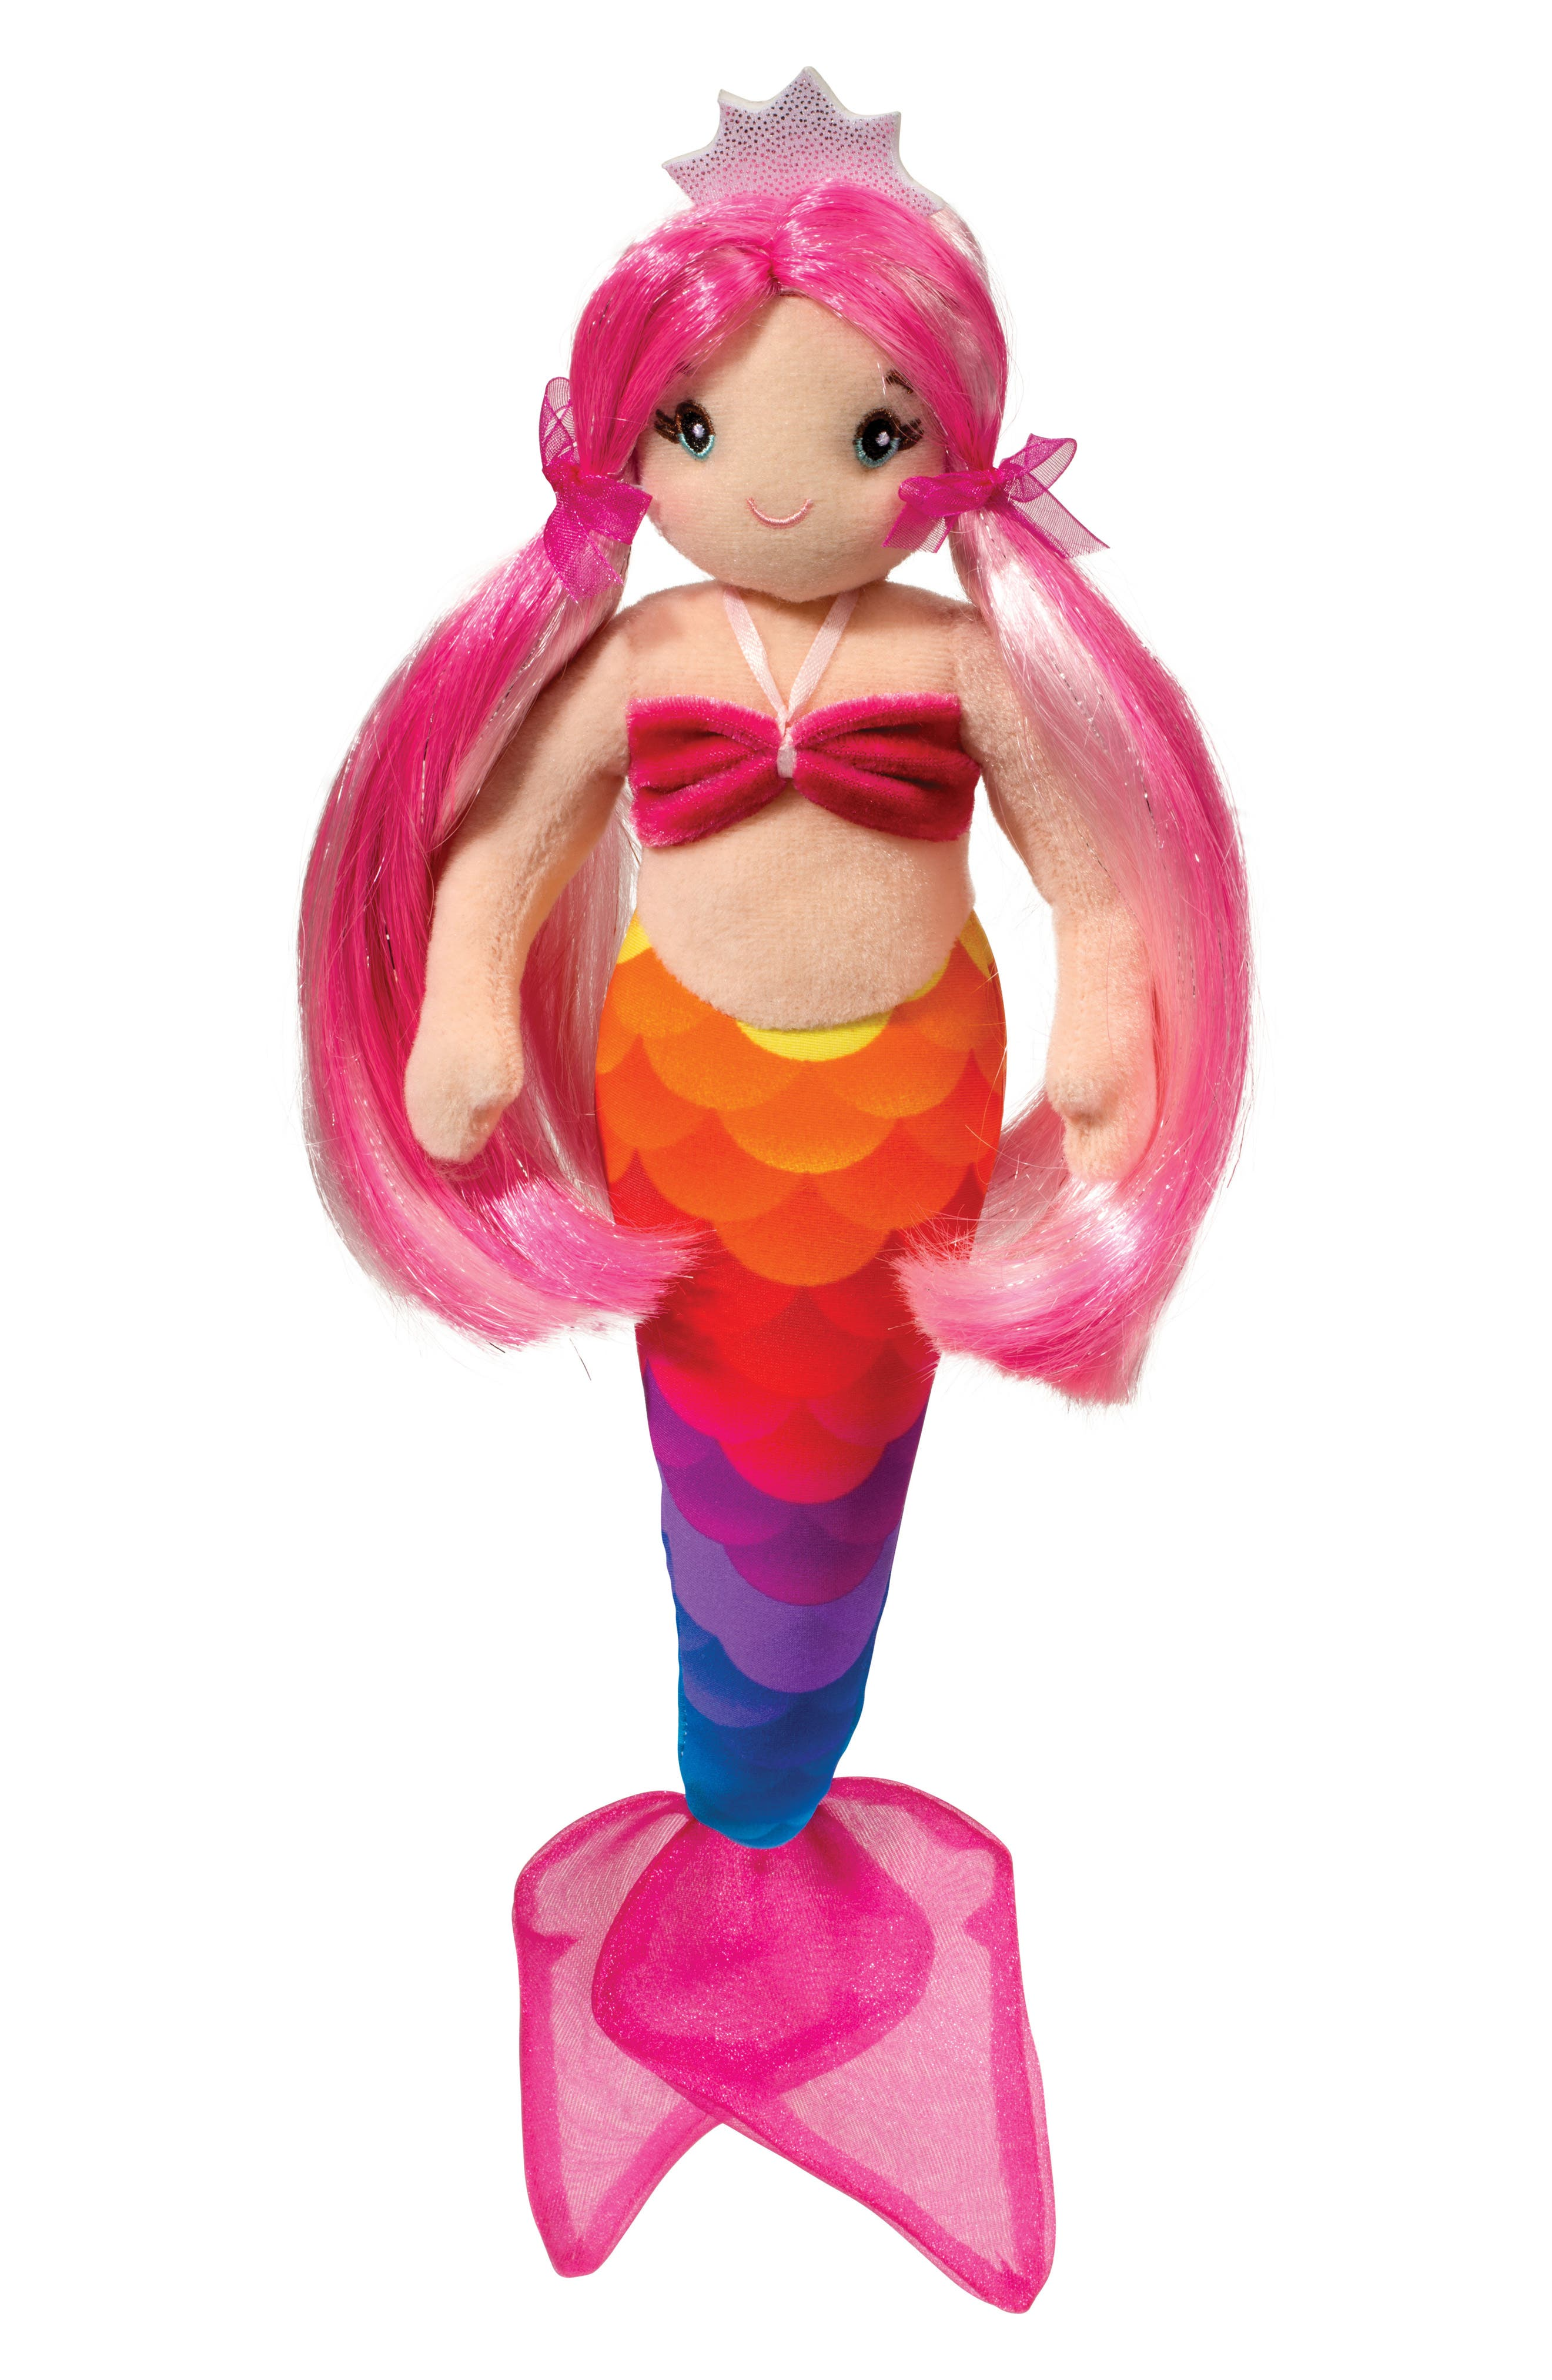 Arissa Rainbow Mermaid Doll,                             Main thumbnail 1, color,                             650